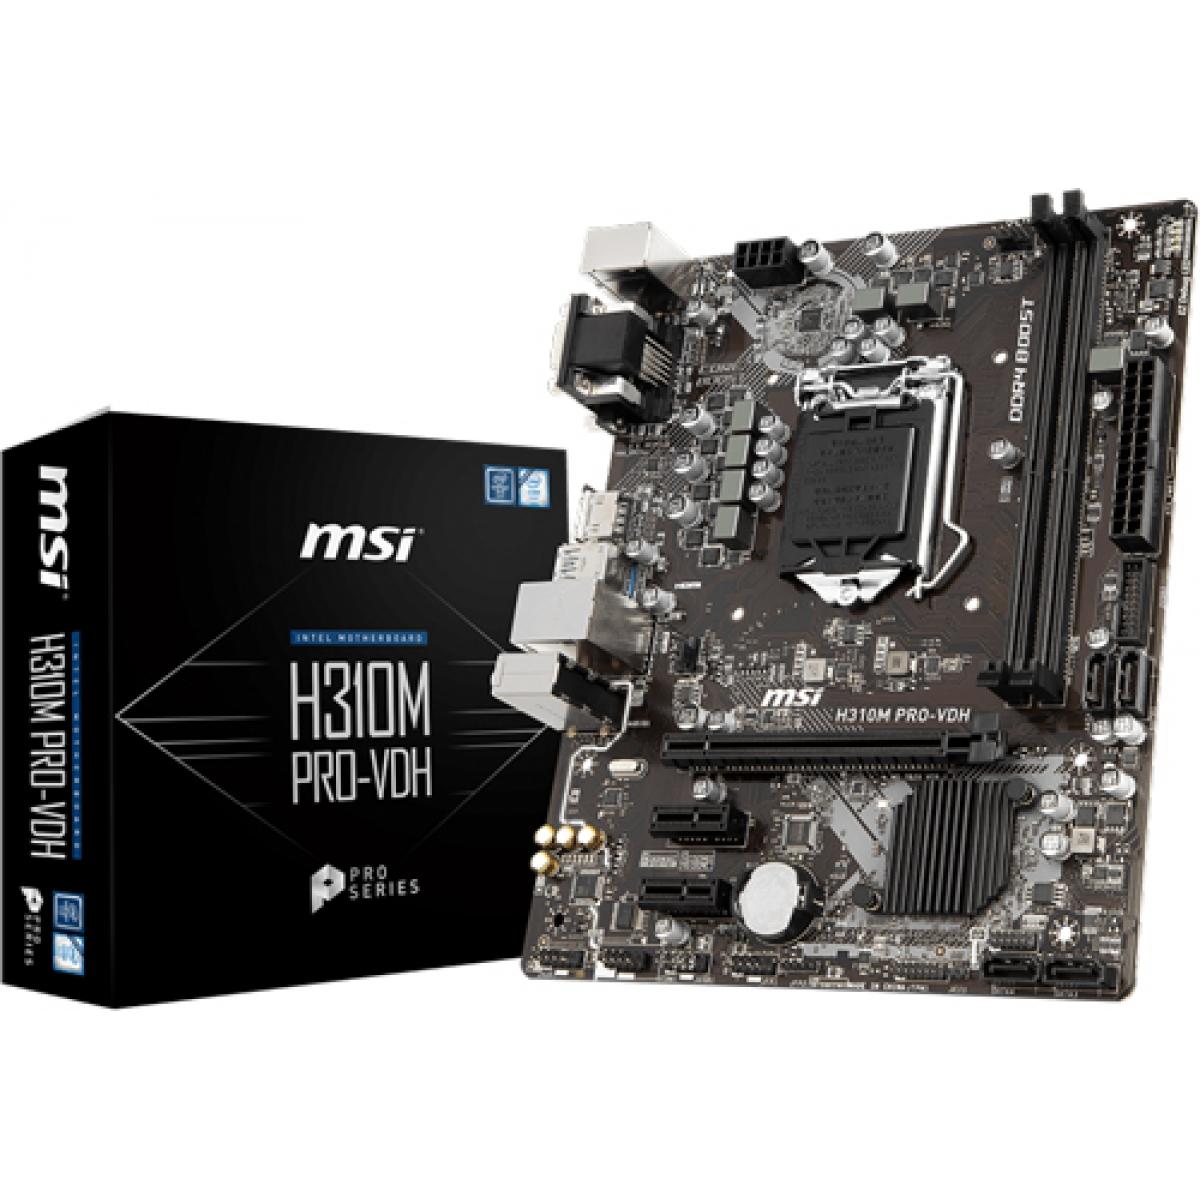 Placa Mãe MSI H310M PRO-VDH, Chipset H310, Intel LGA 1151, mATX, DDR4